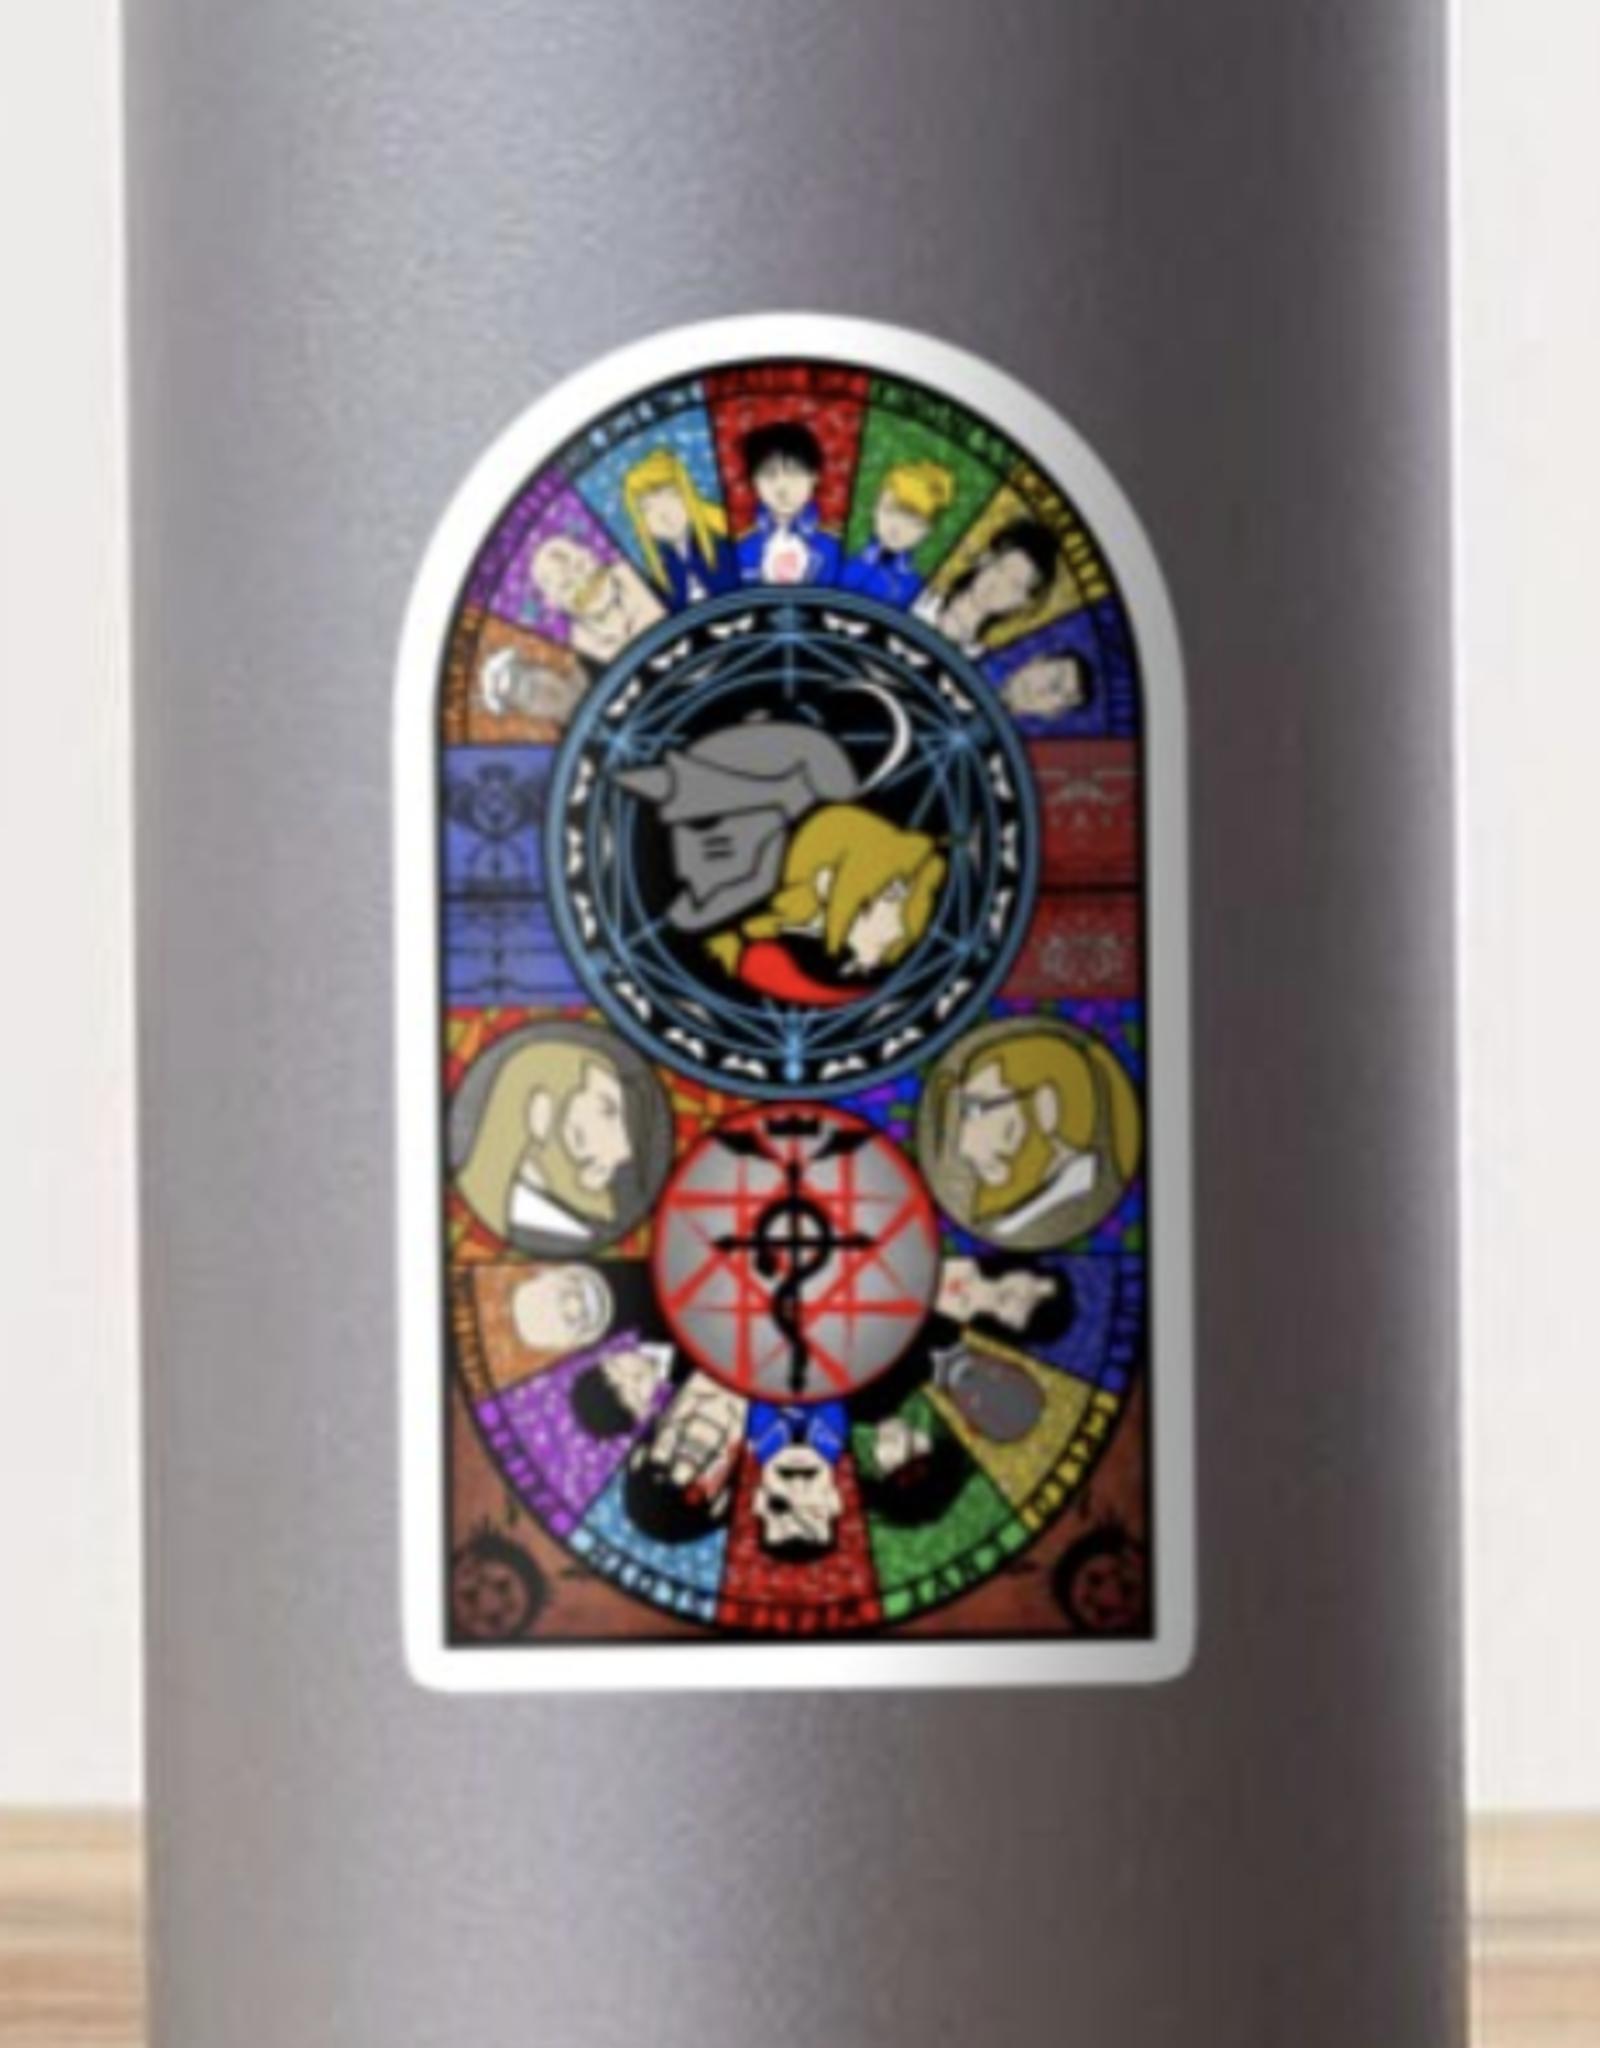 Fullmetal Alchemist Stained Glass Sticker